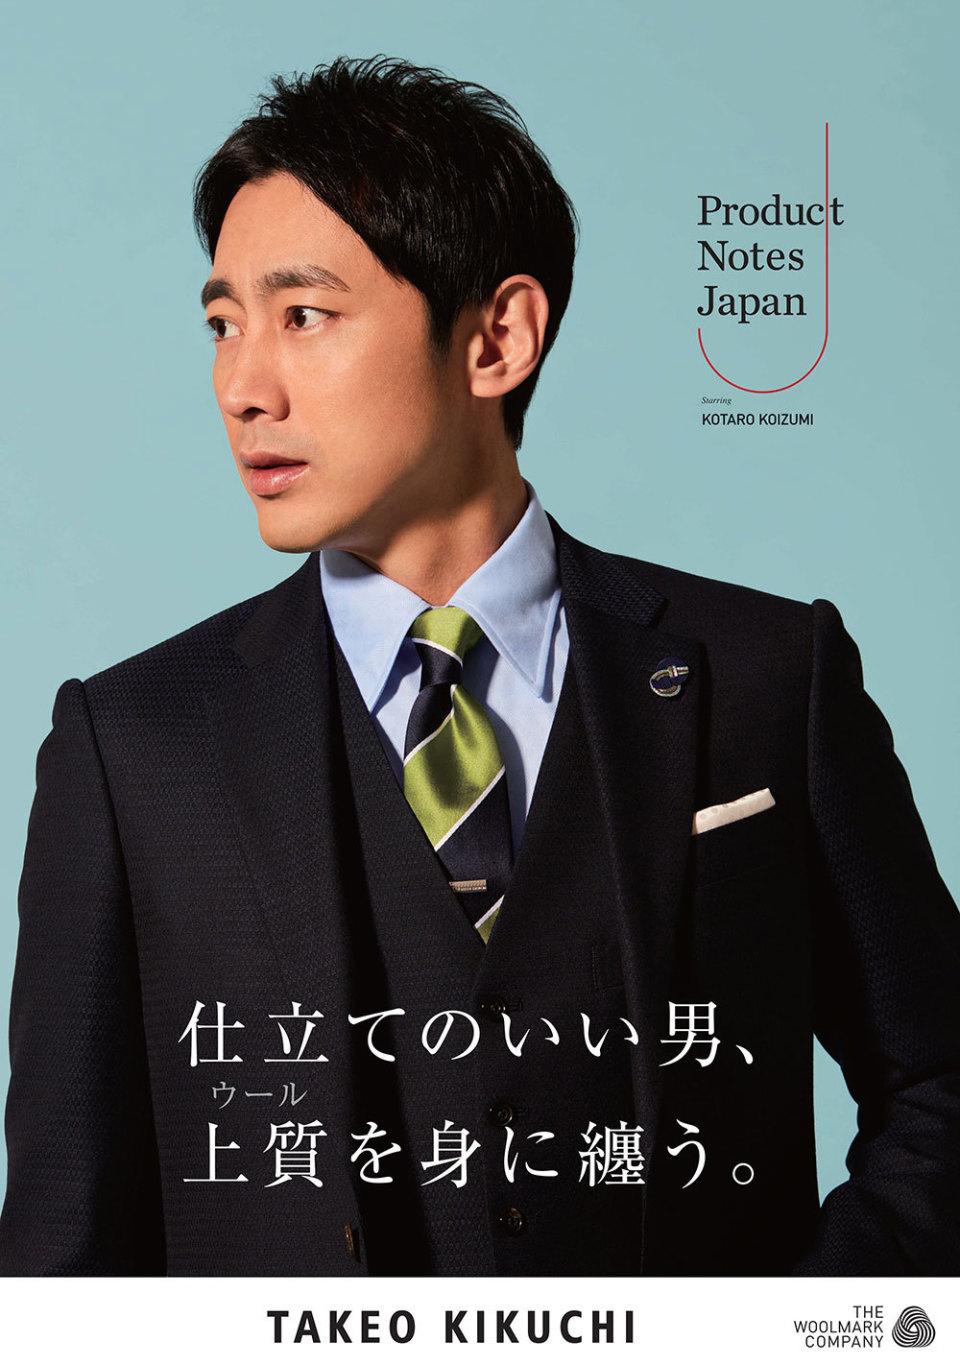 TAKEO KIKUCHIの新作は「スーツ×日本の伝統美」 1番目の画像